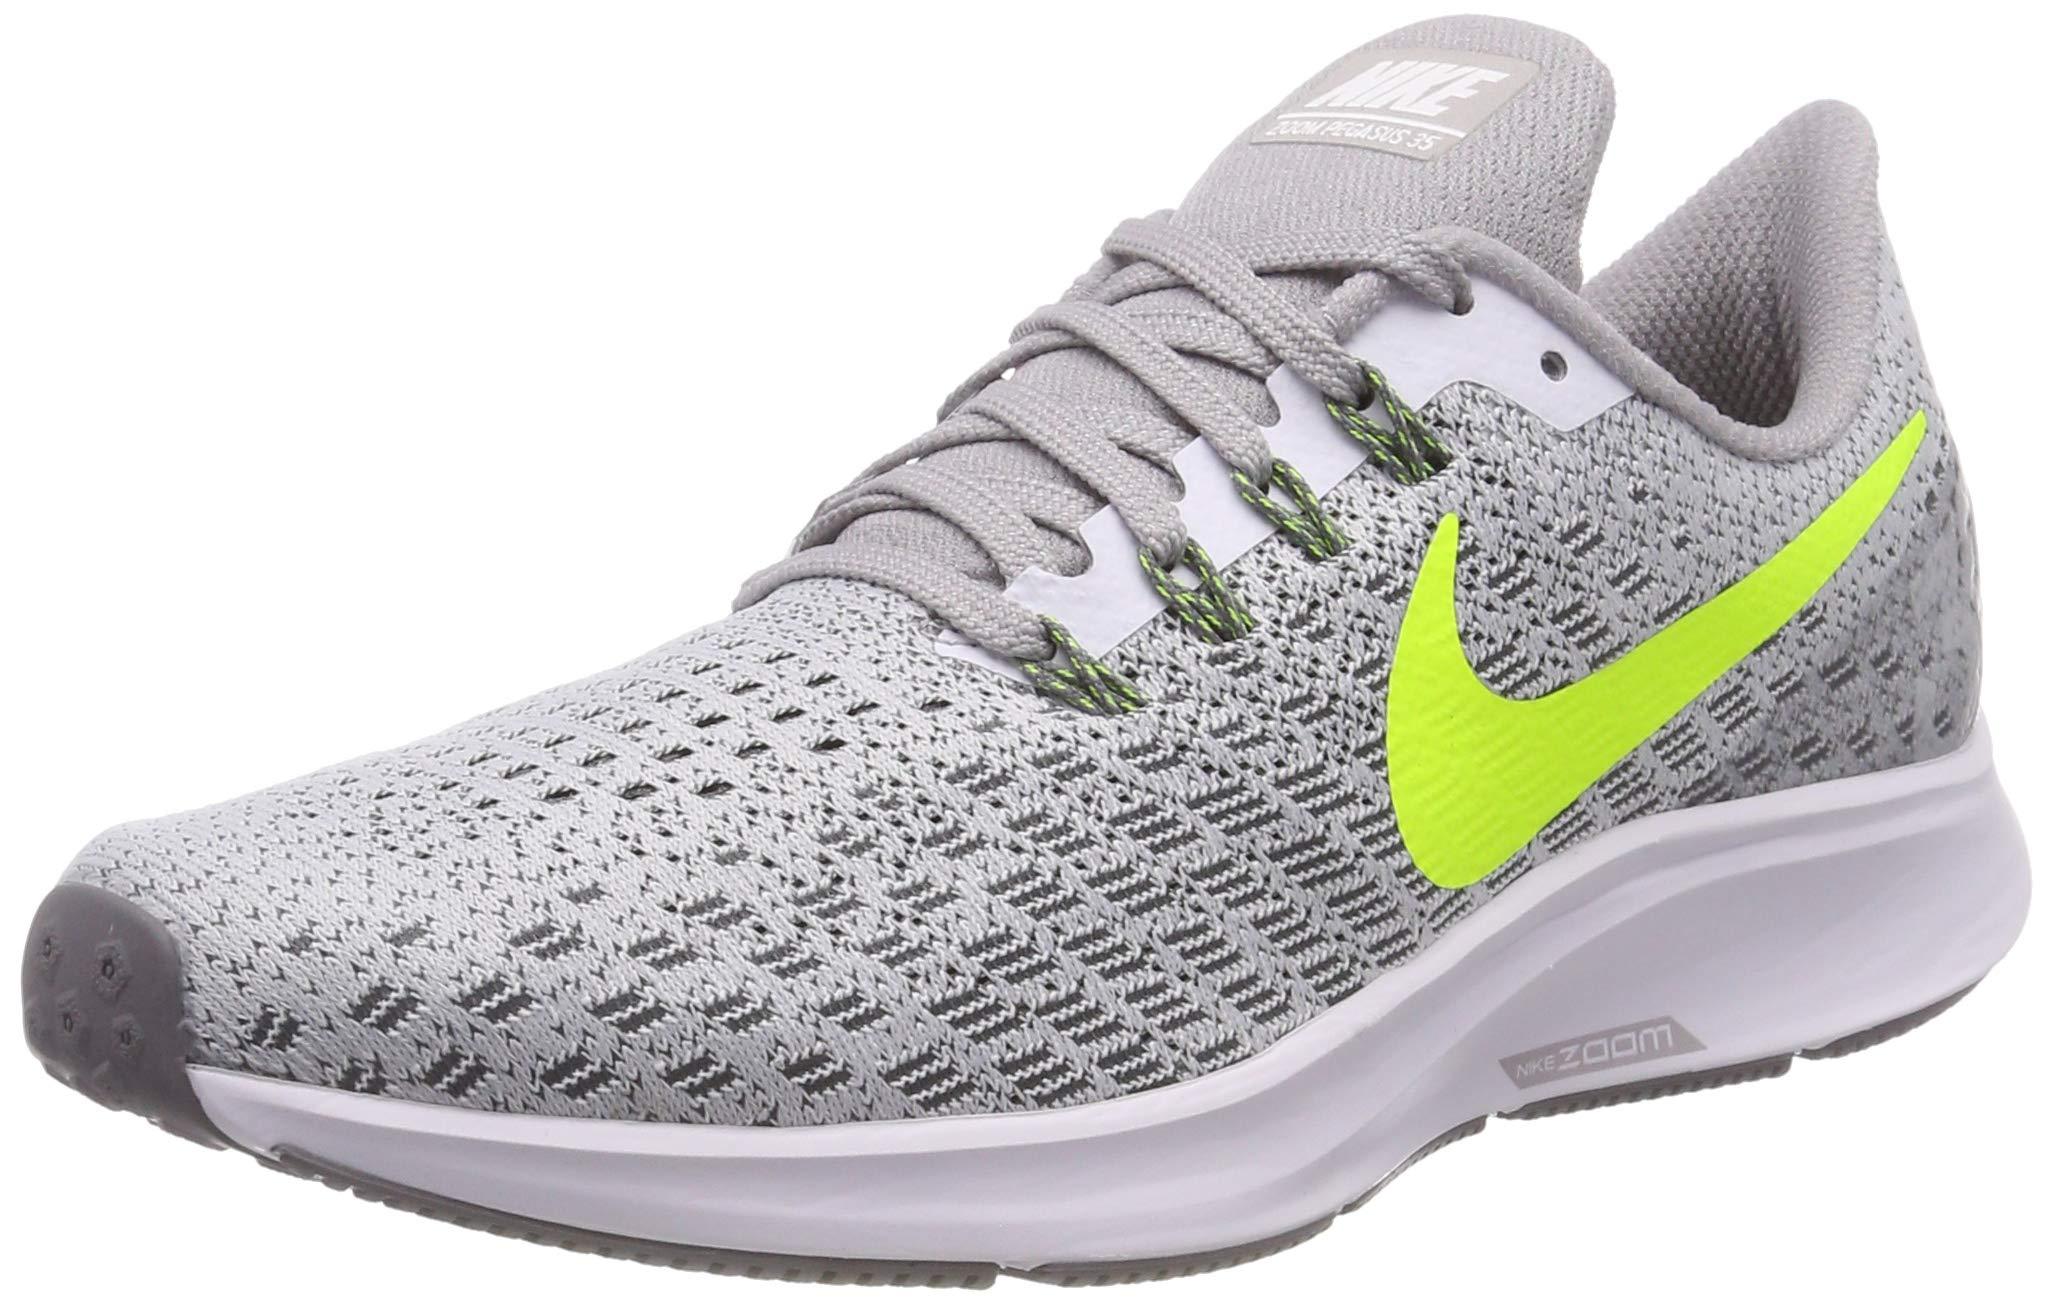 Nike Air Zoom Pegasus 35 (6-M, White/Gunsmoke/Atmosphere Grey/Volt)